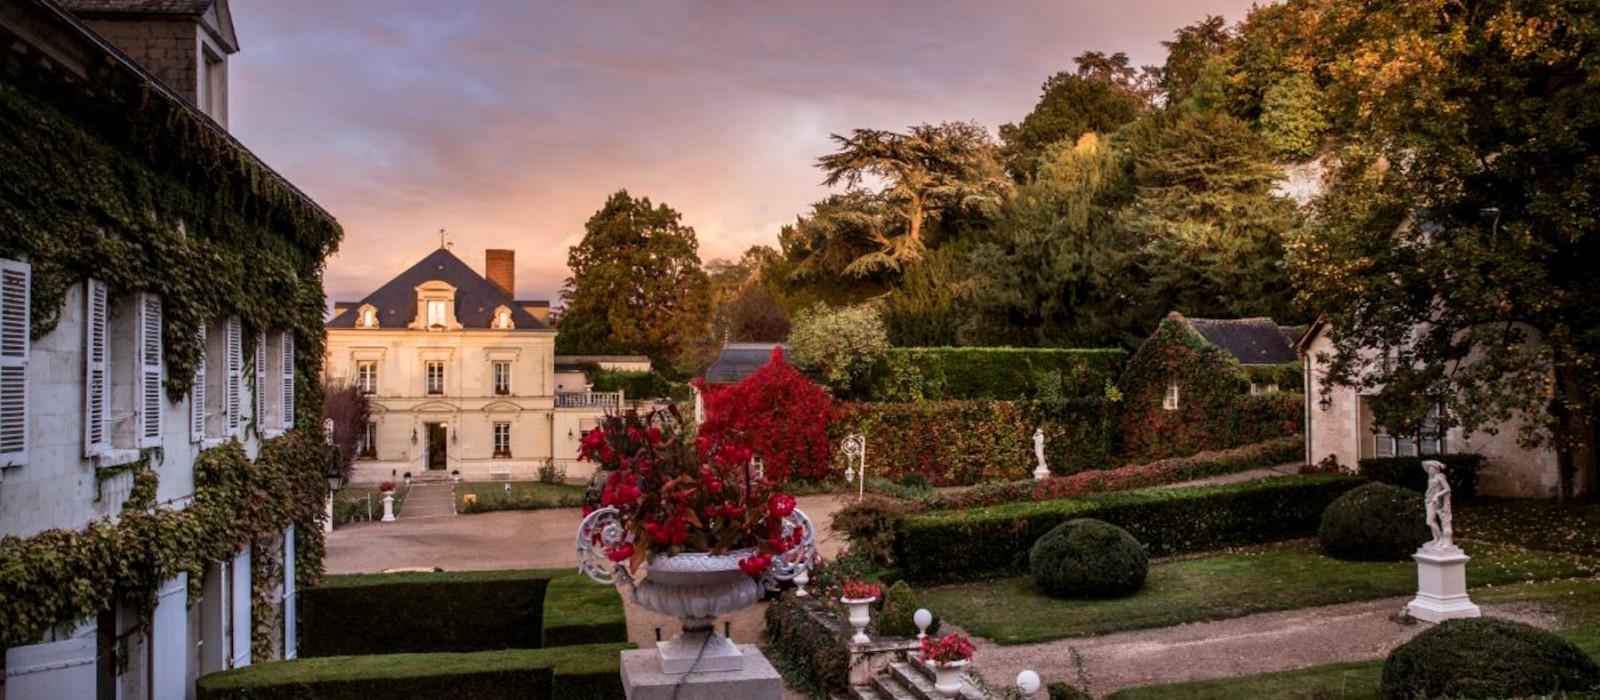 Hotel  Le Choiseul France